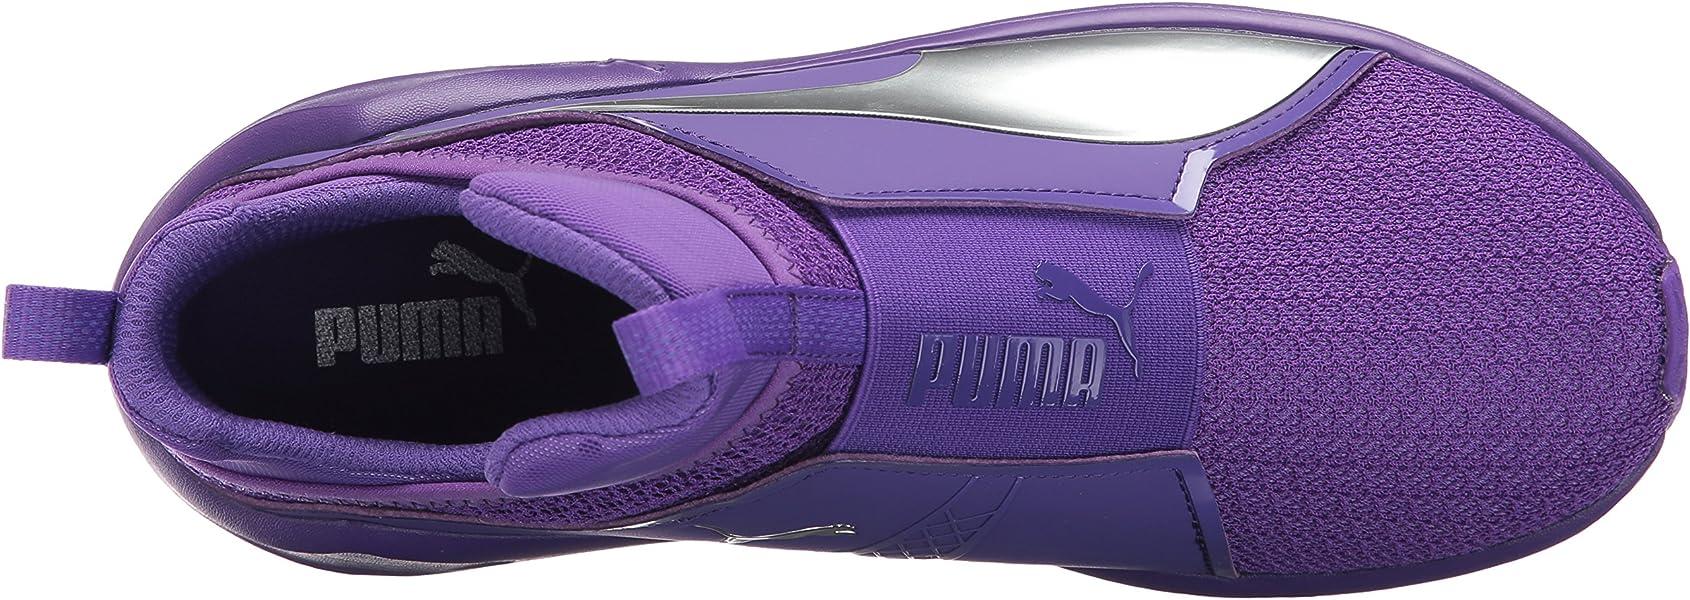 1a10c5724296 ... PUMA Women s Fierce Culture SURF Sneaker ...